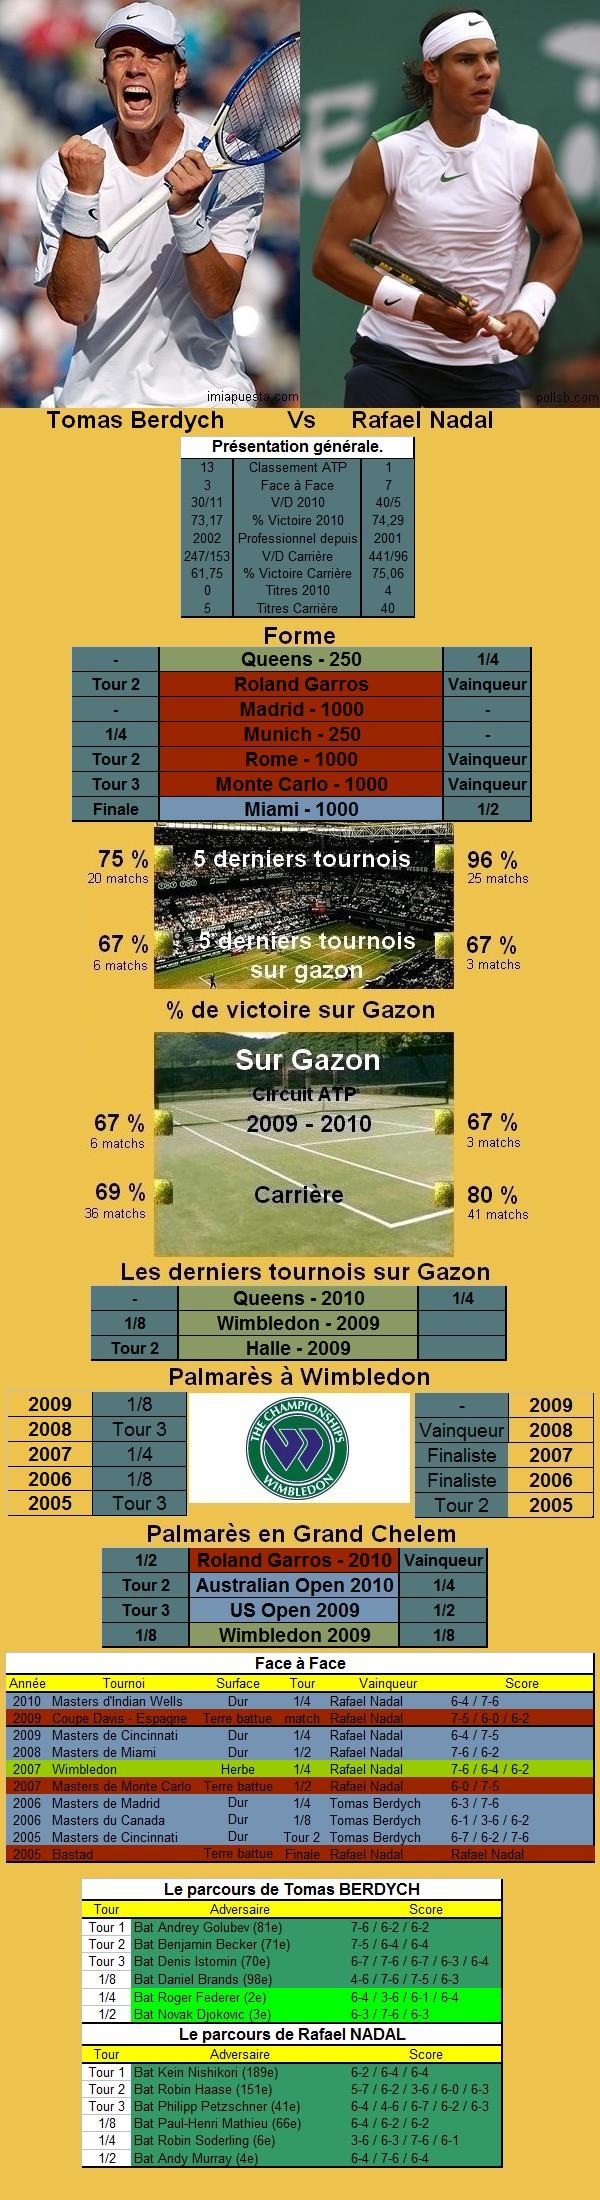 Statistiques tennis de Berdych contre Nadal à Wimbledon